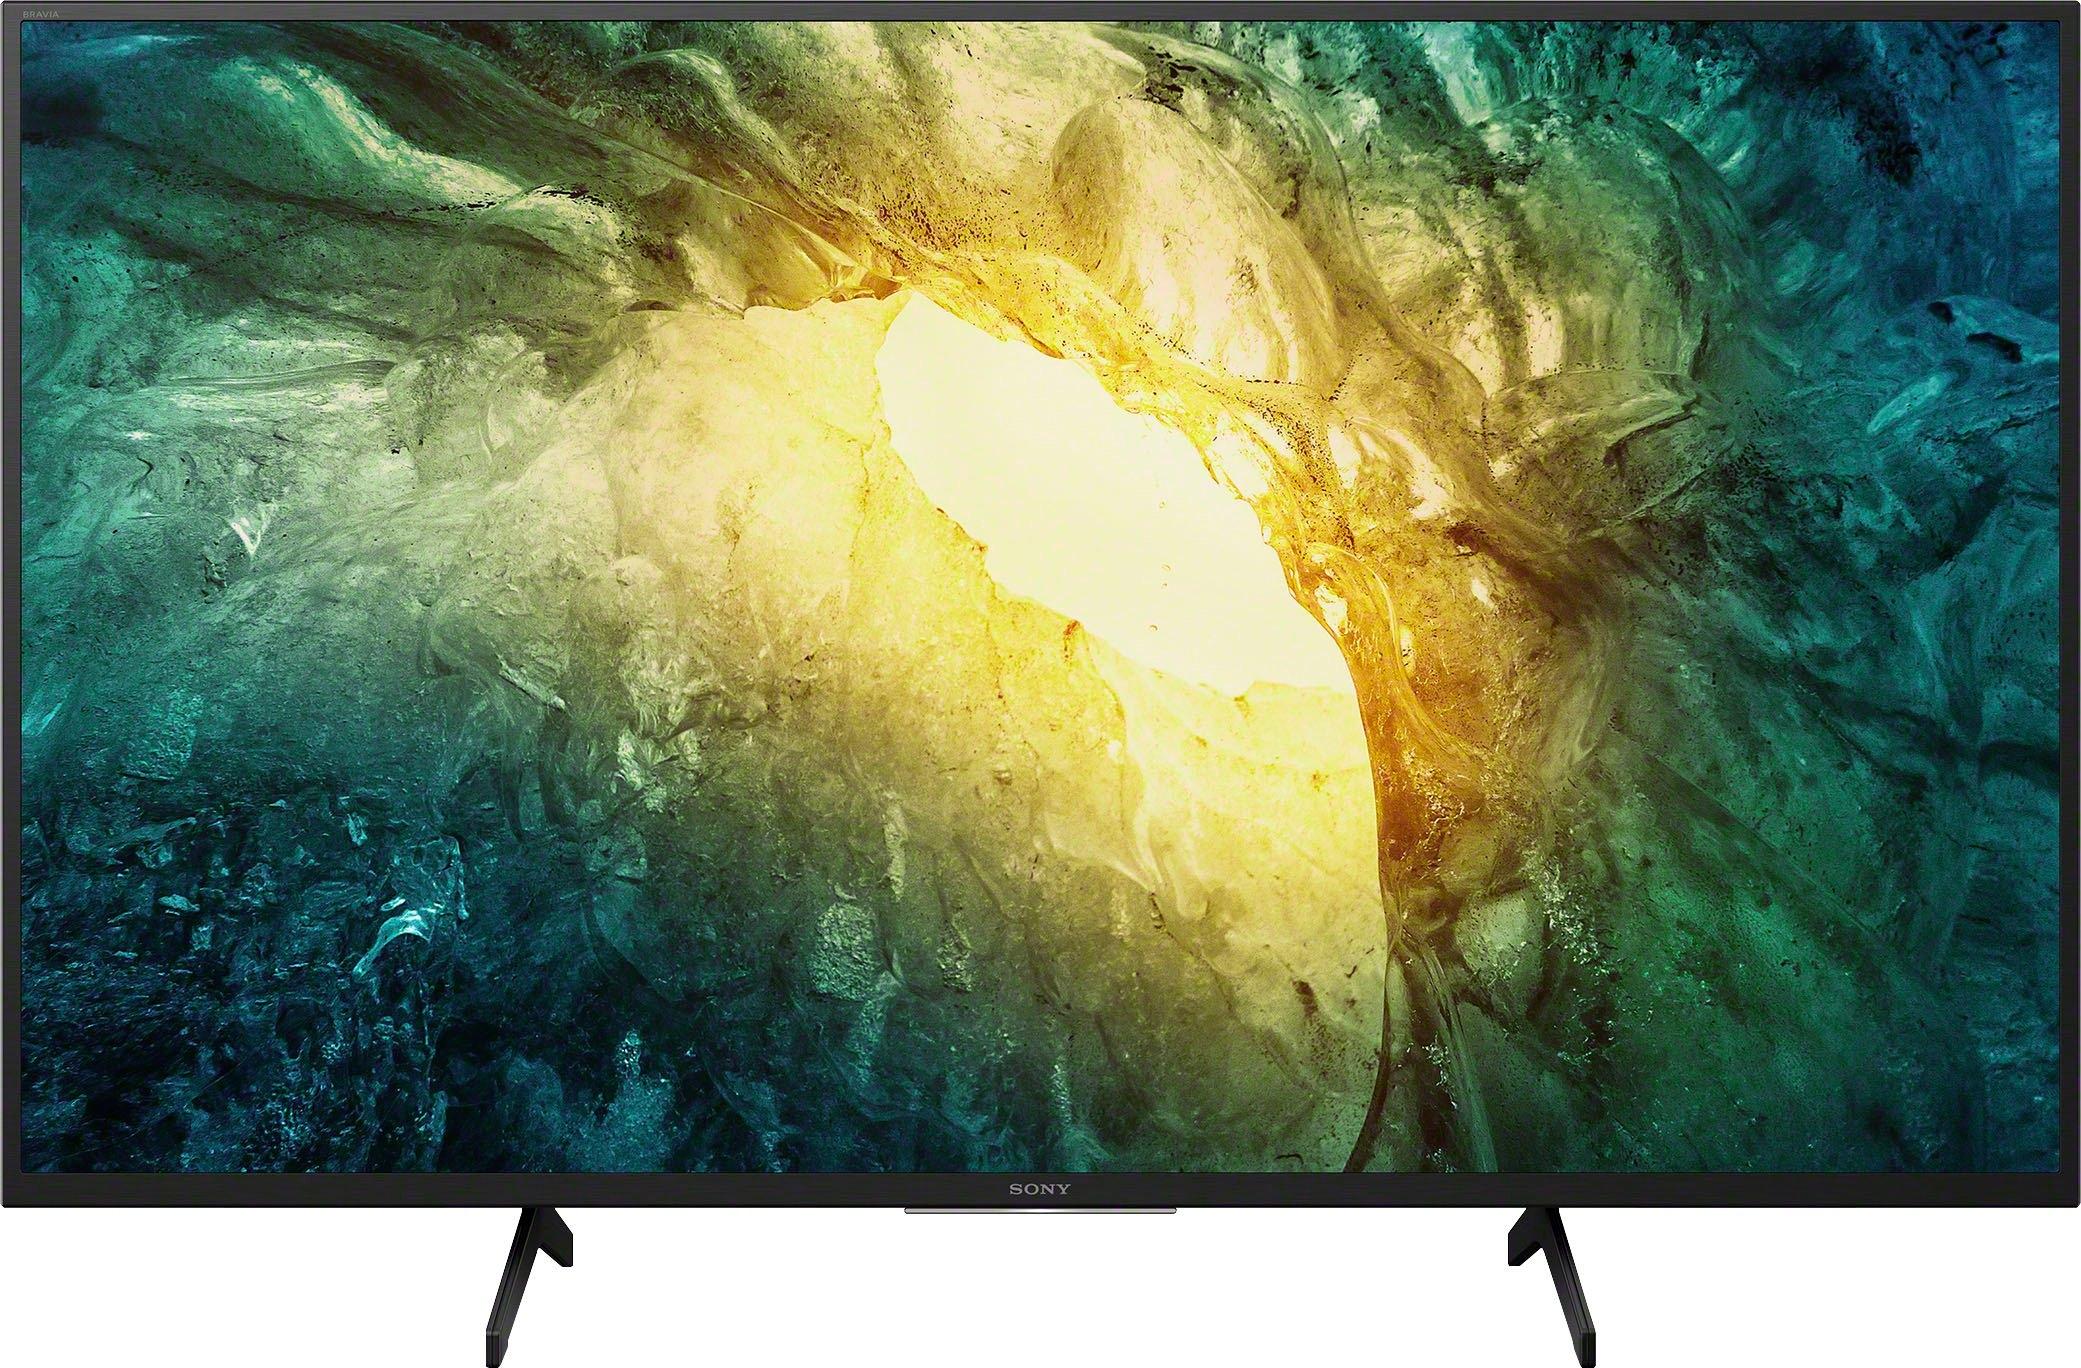 Sony LED-TV KD-49X7055, 123 cm / 49